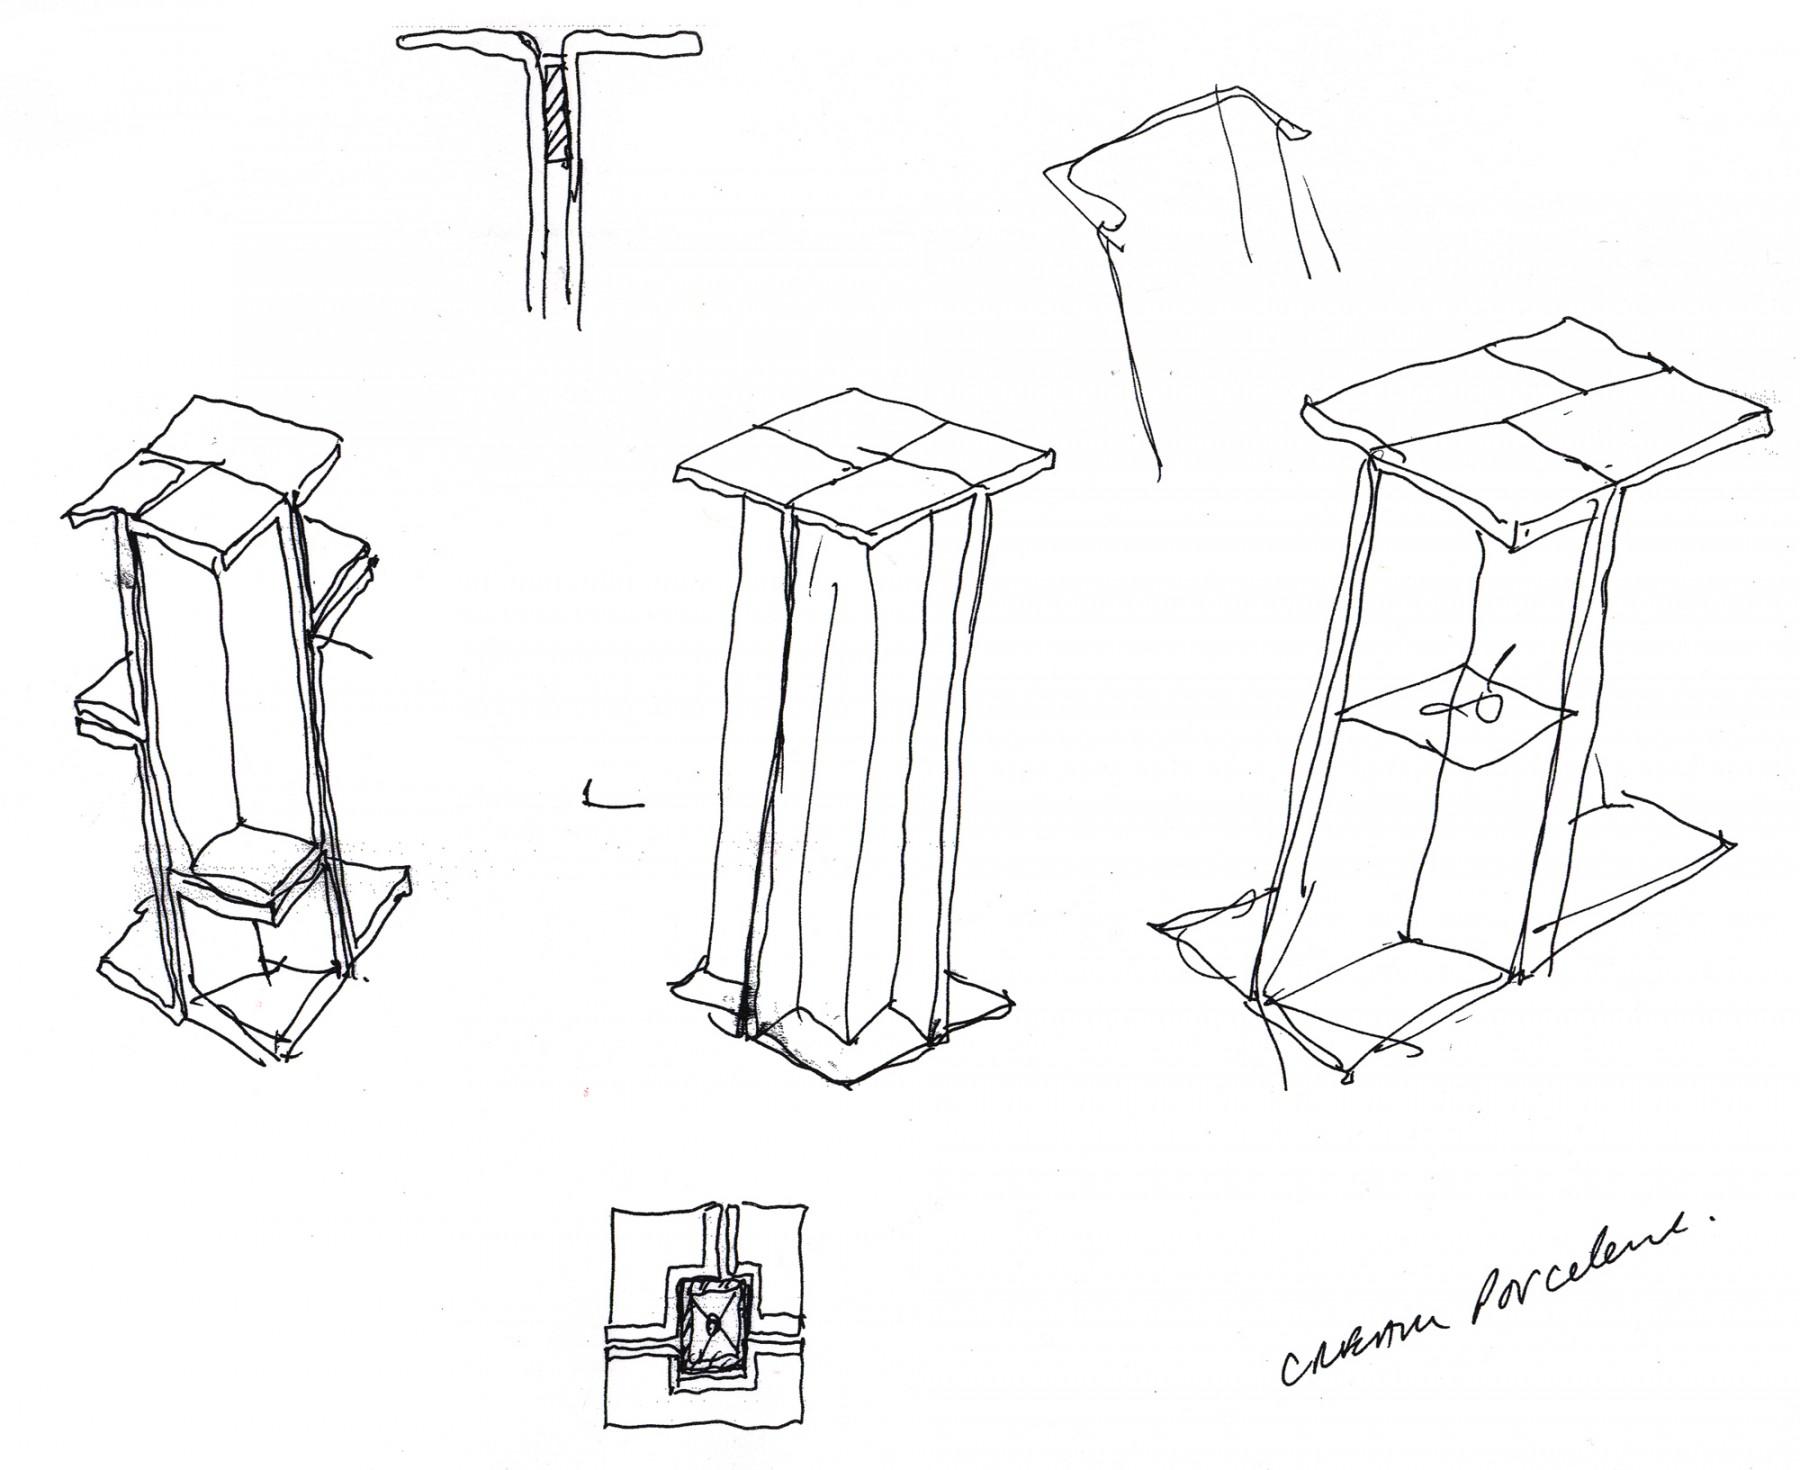 Selfridges-London-designer-fashion-retail-Jamie-Fobert-Architects-shoe-galleries-alabaster-plinths-sketches-1